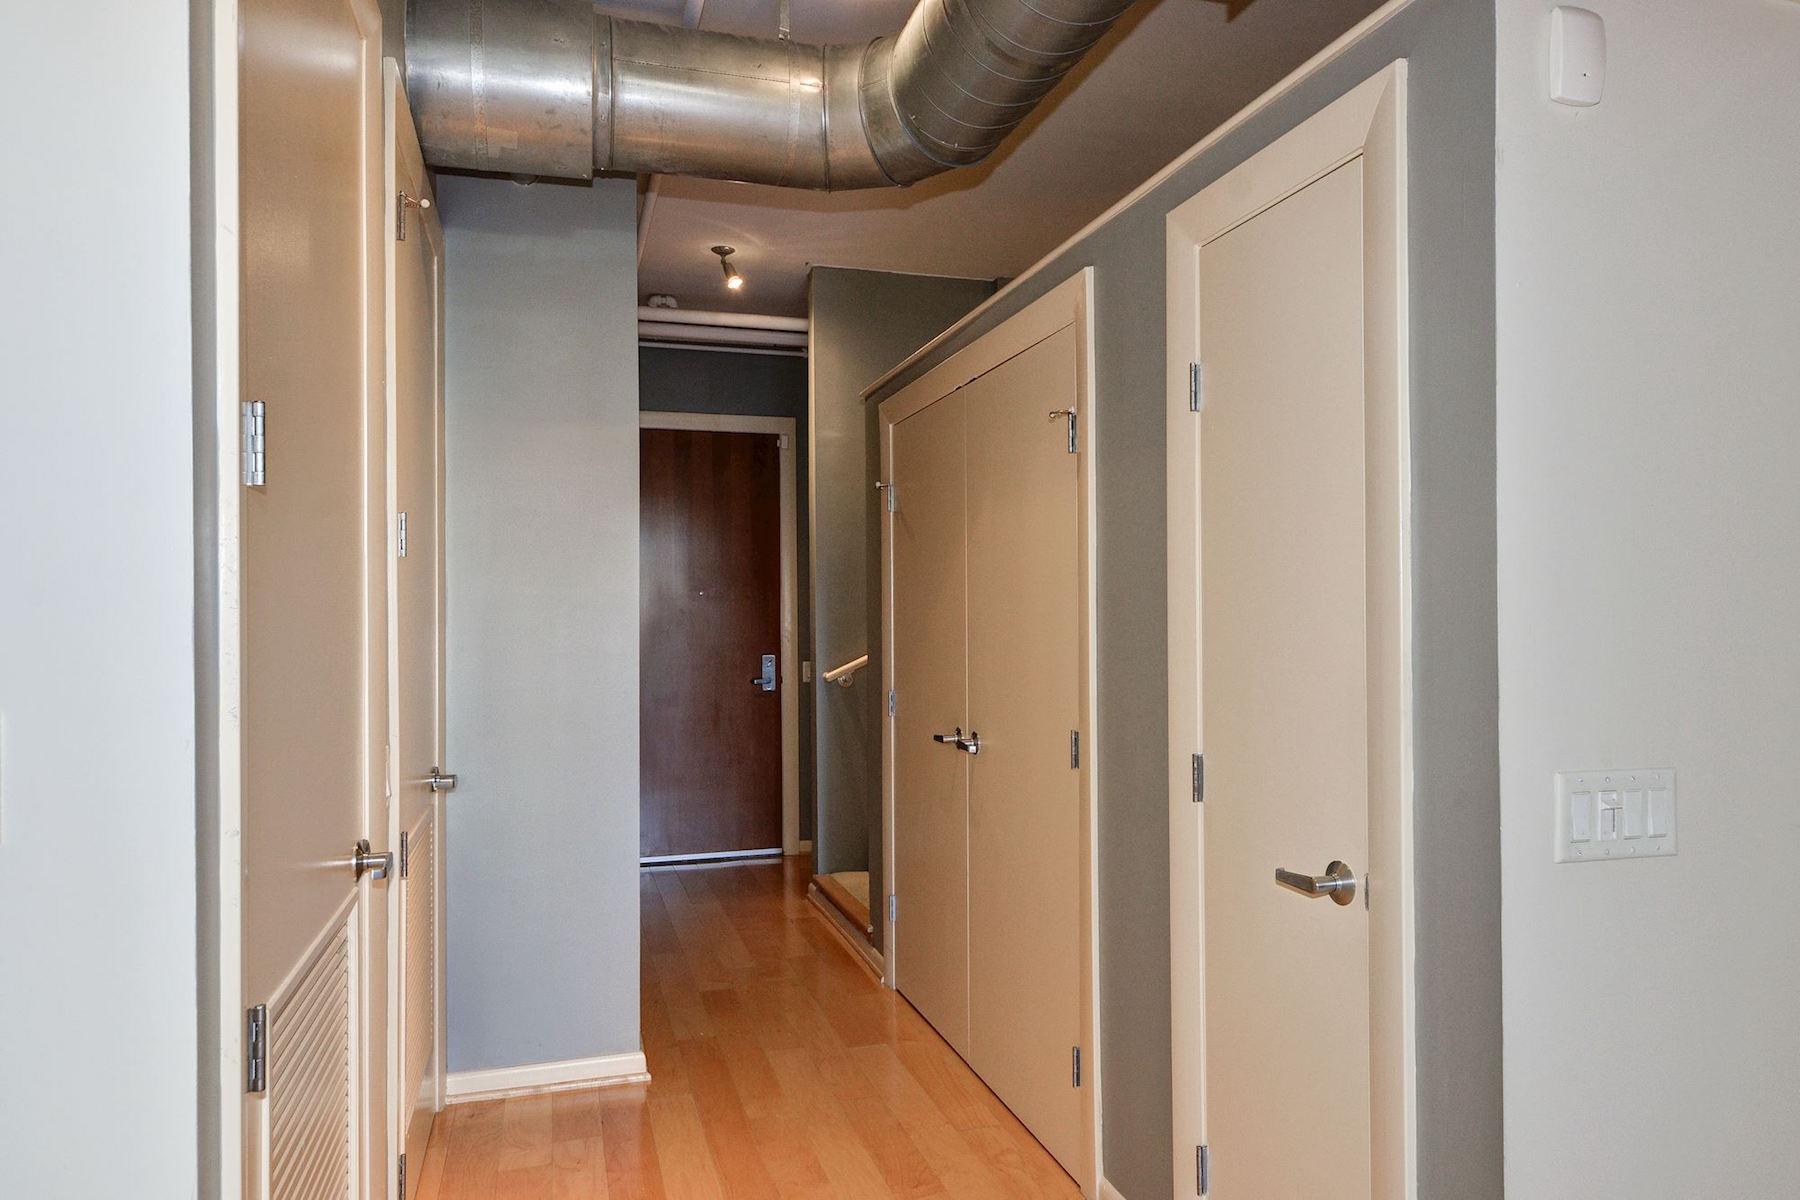 Additional photo for property listing at Madrigal Lofts 811 4th Street Nw 114 Washington, Distretto Di Columbia 20001 Stati Uniti